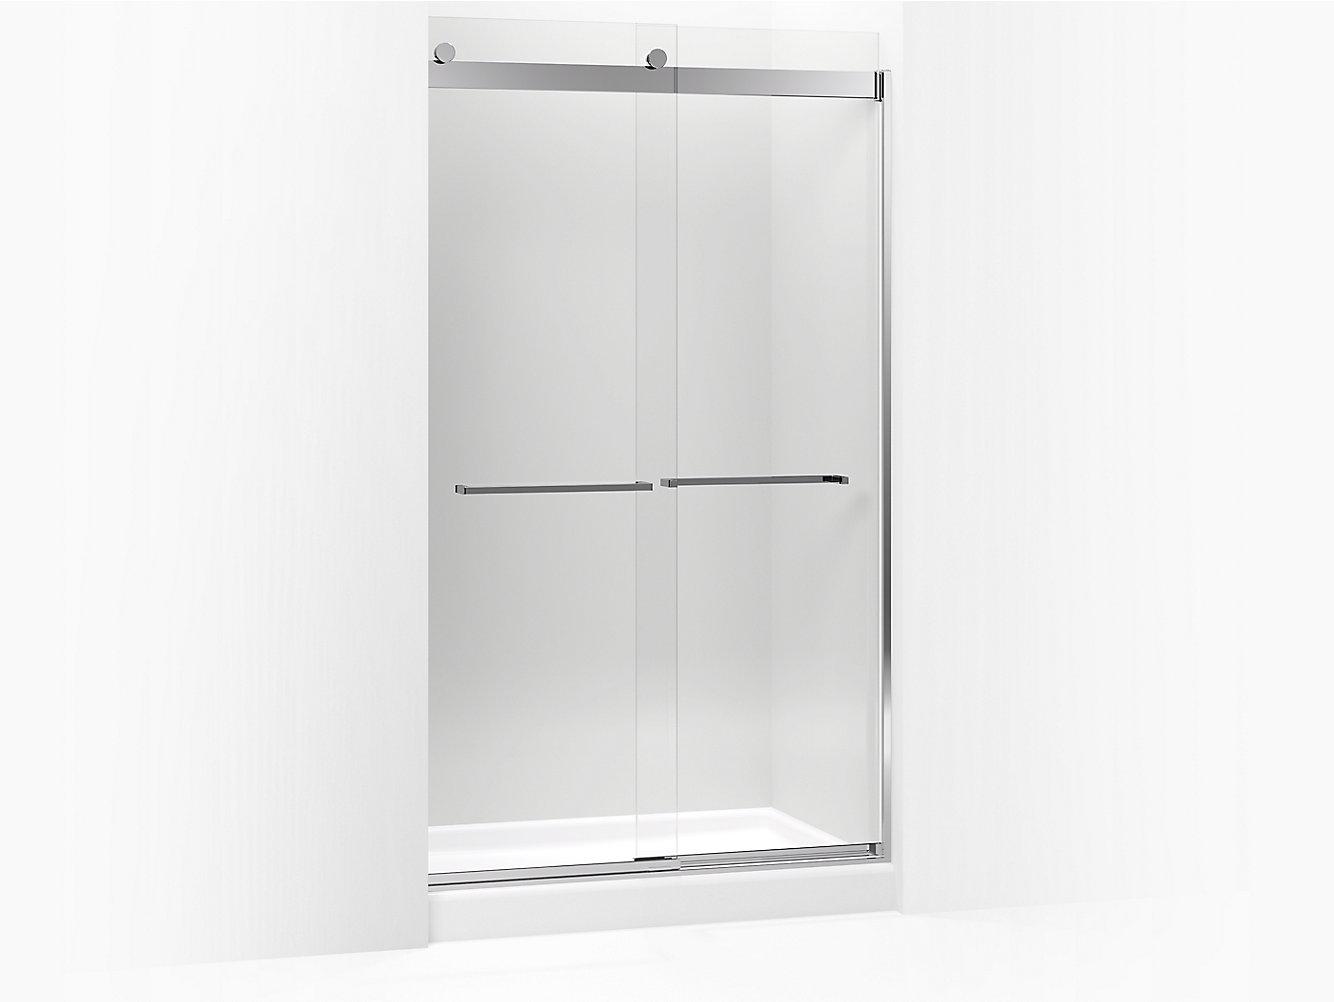 K 706017 L Levity Sliding Shower Door 82 H X 44 58 47 58 W